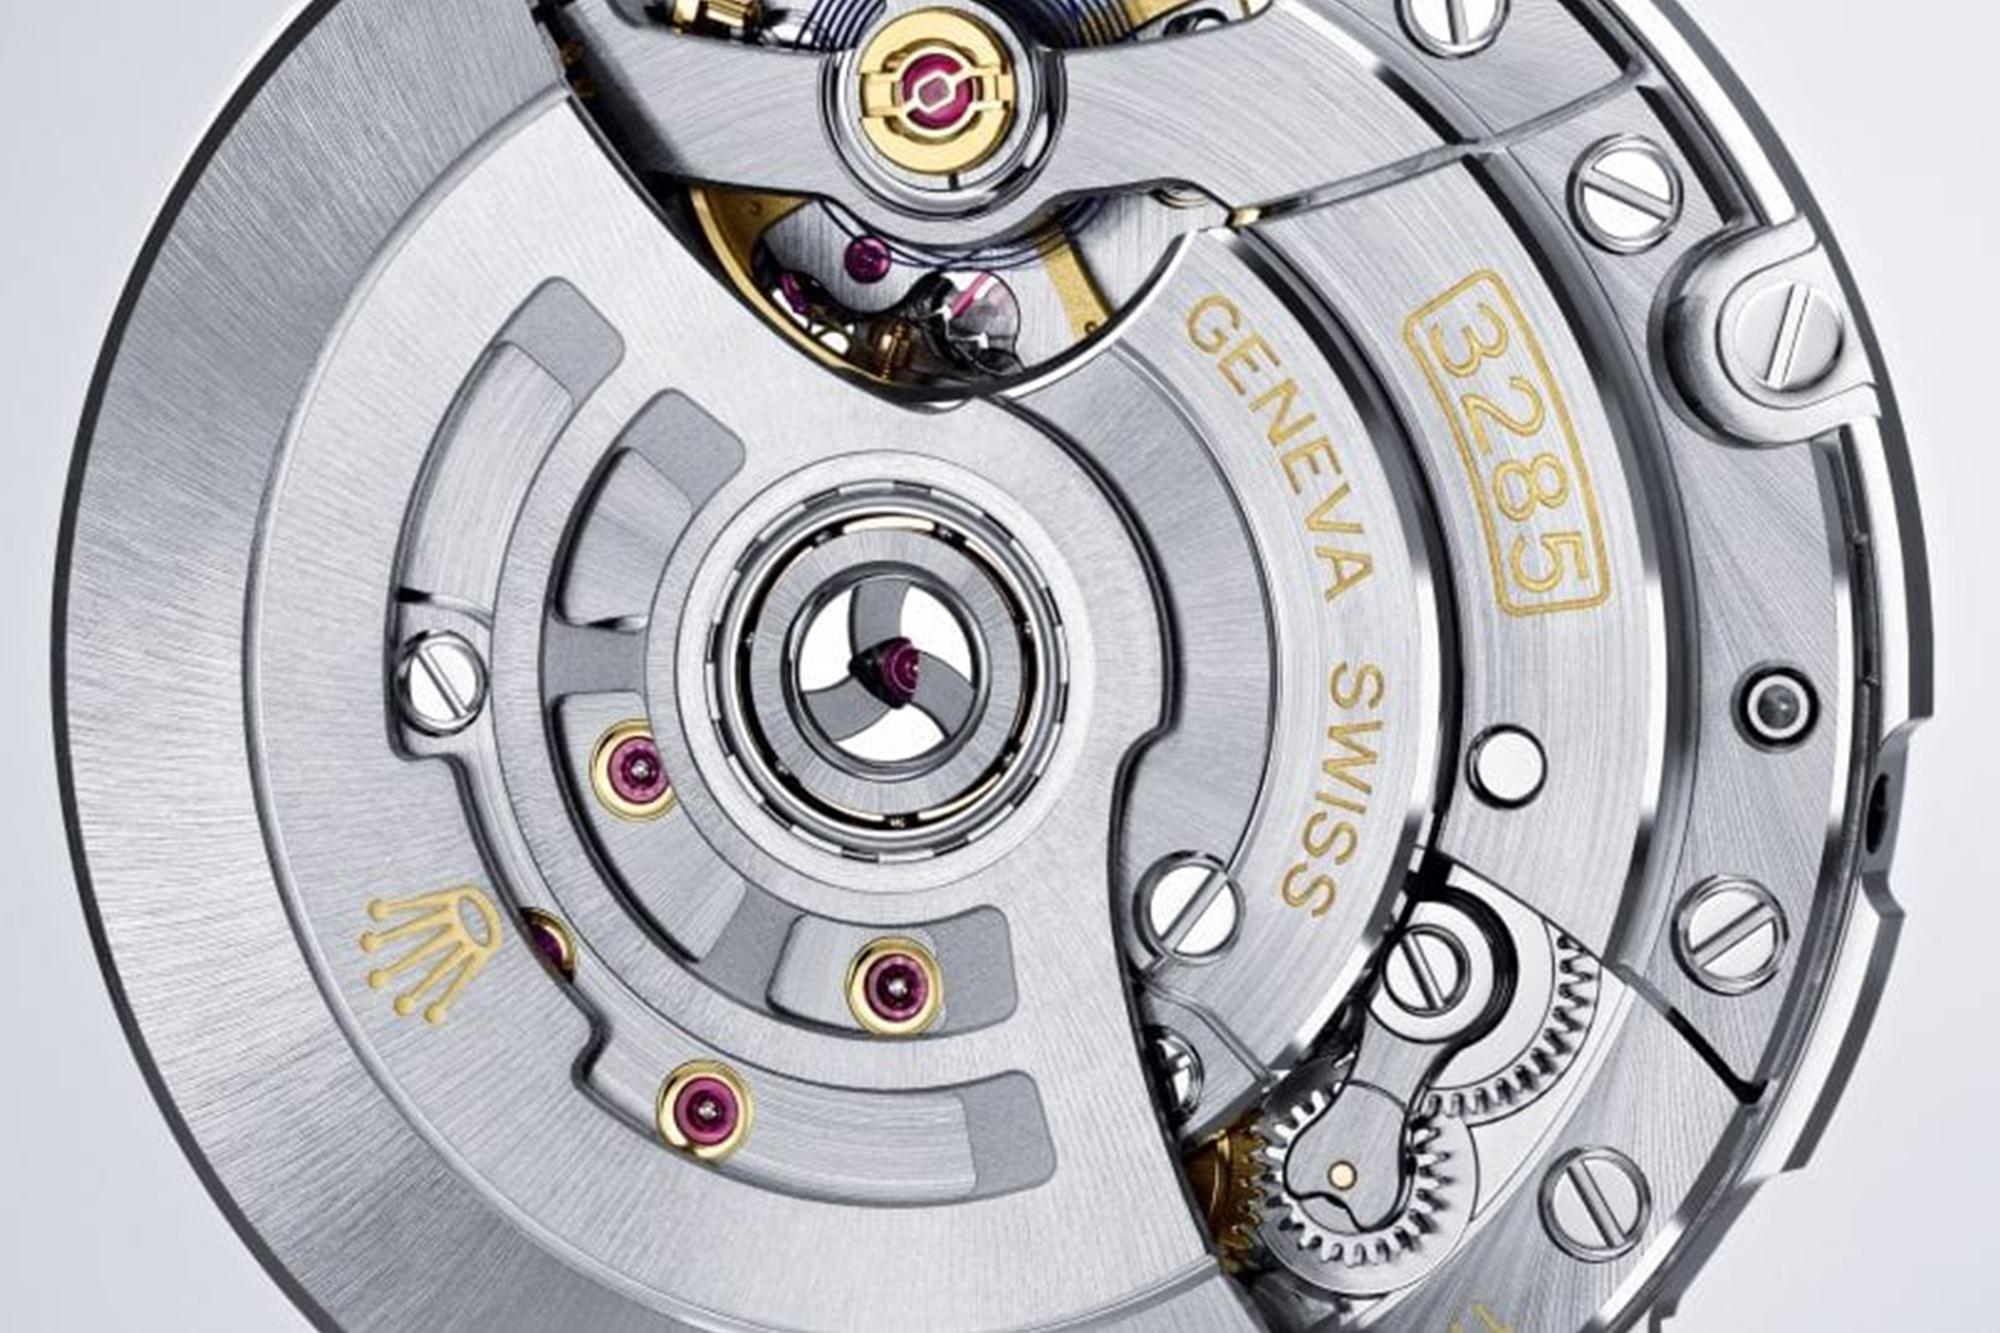 Rolex - Calibre 3285